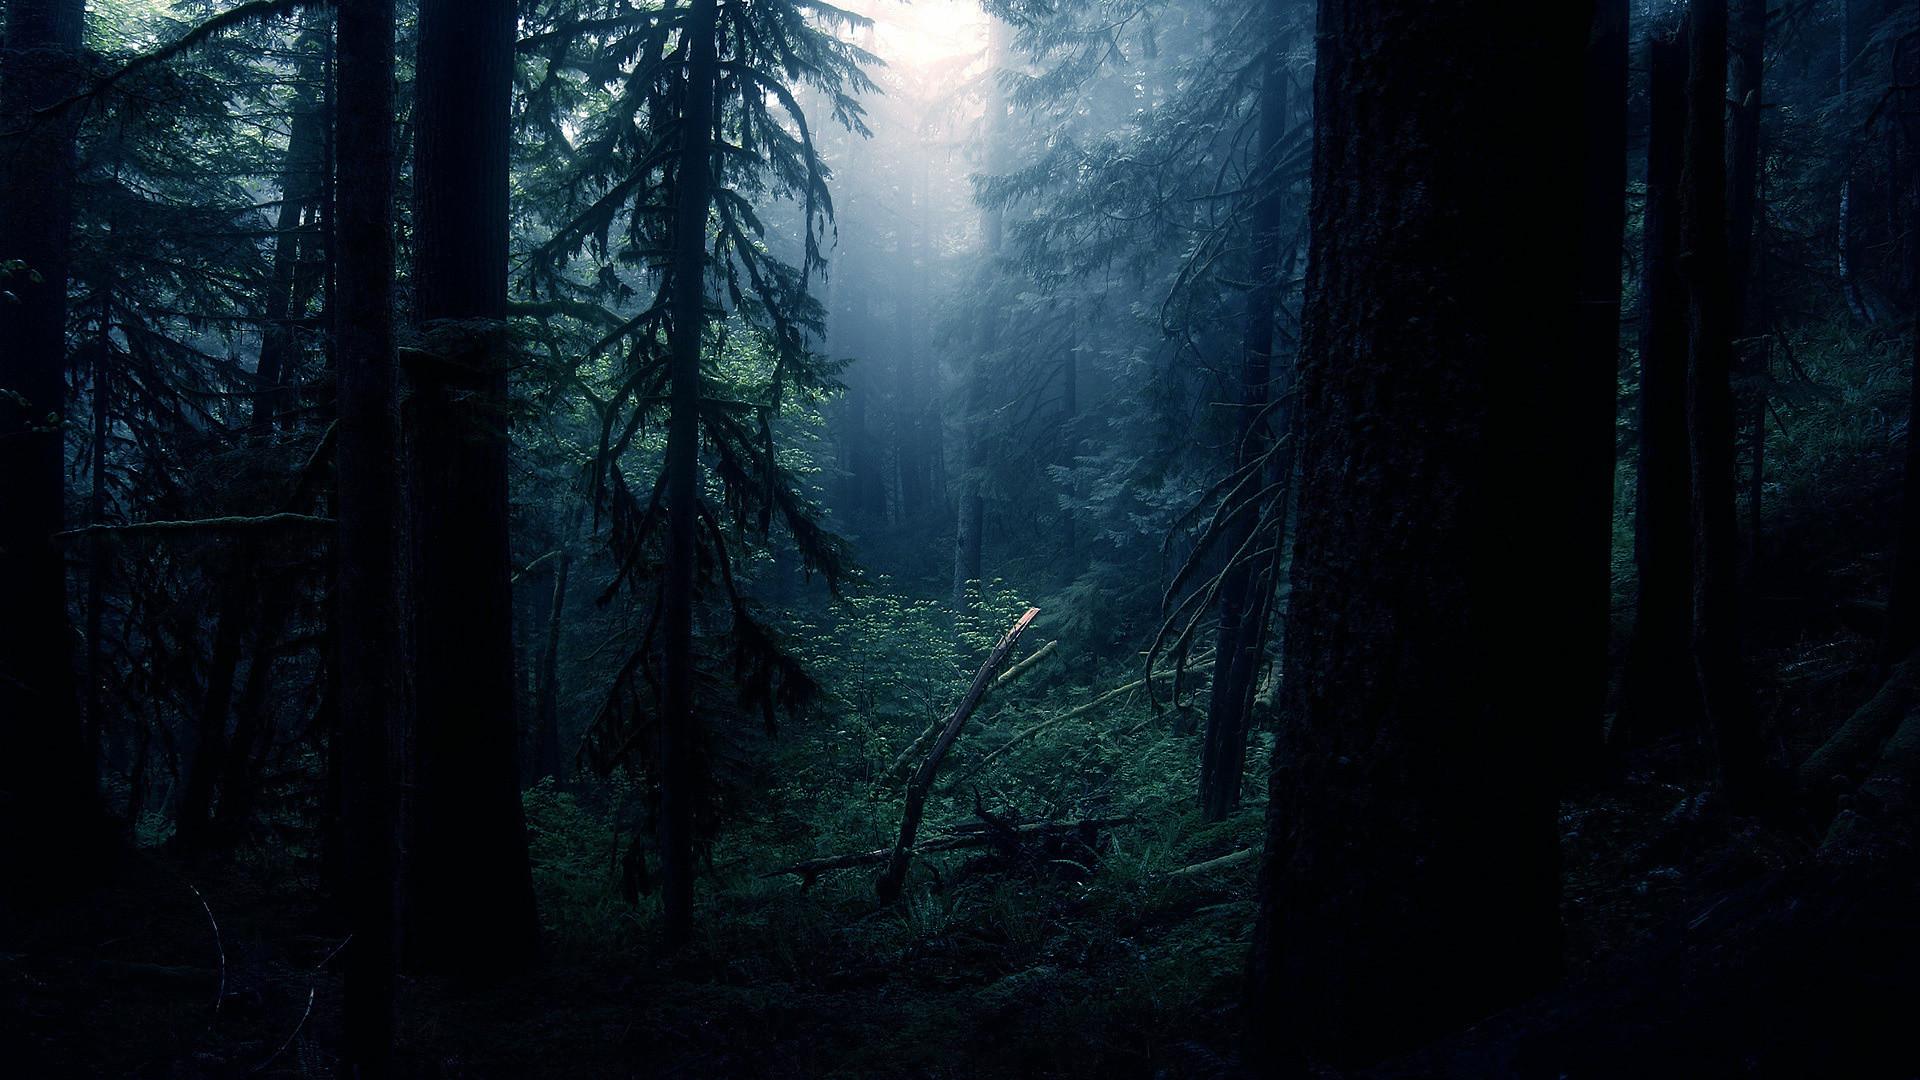 1920x1080 Dark Forest Wallpapers Wallpaper 1920Af 1080 Creepy Backgrounds 35